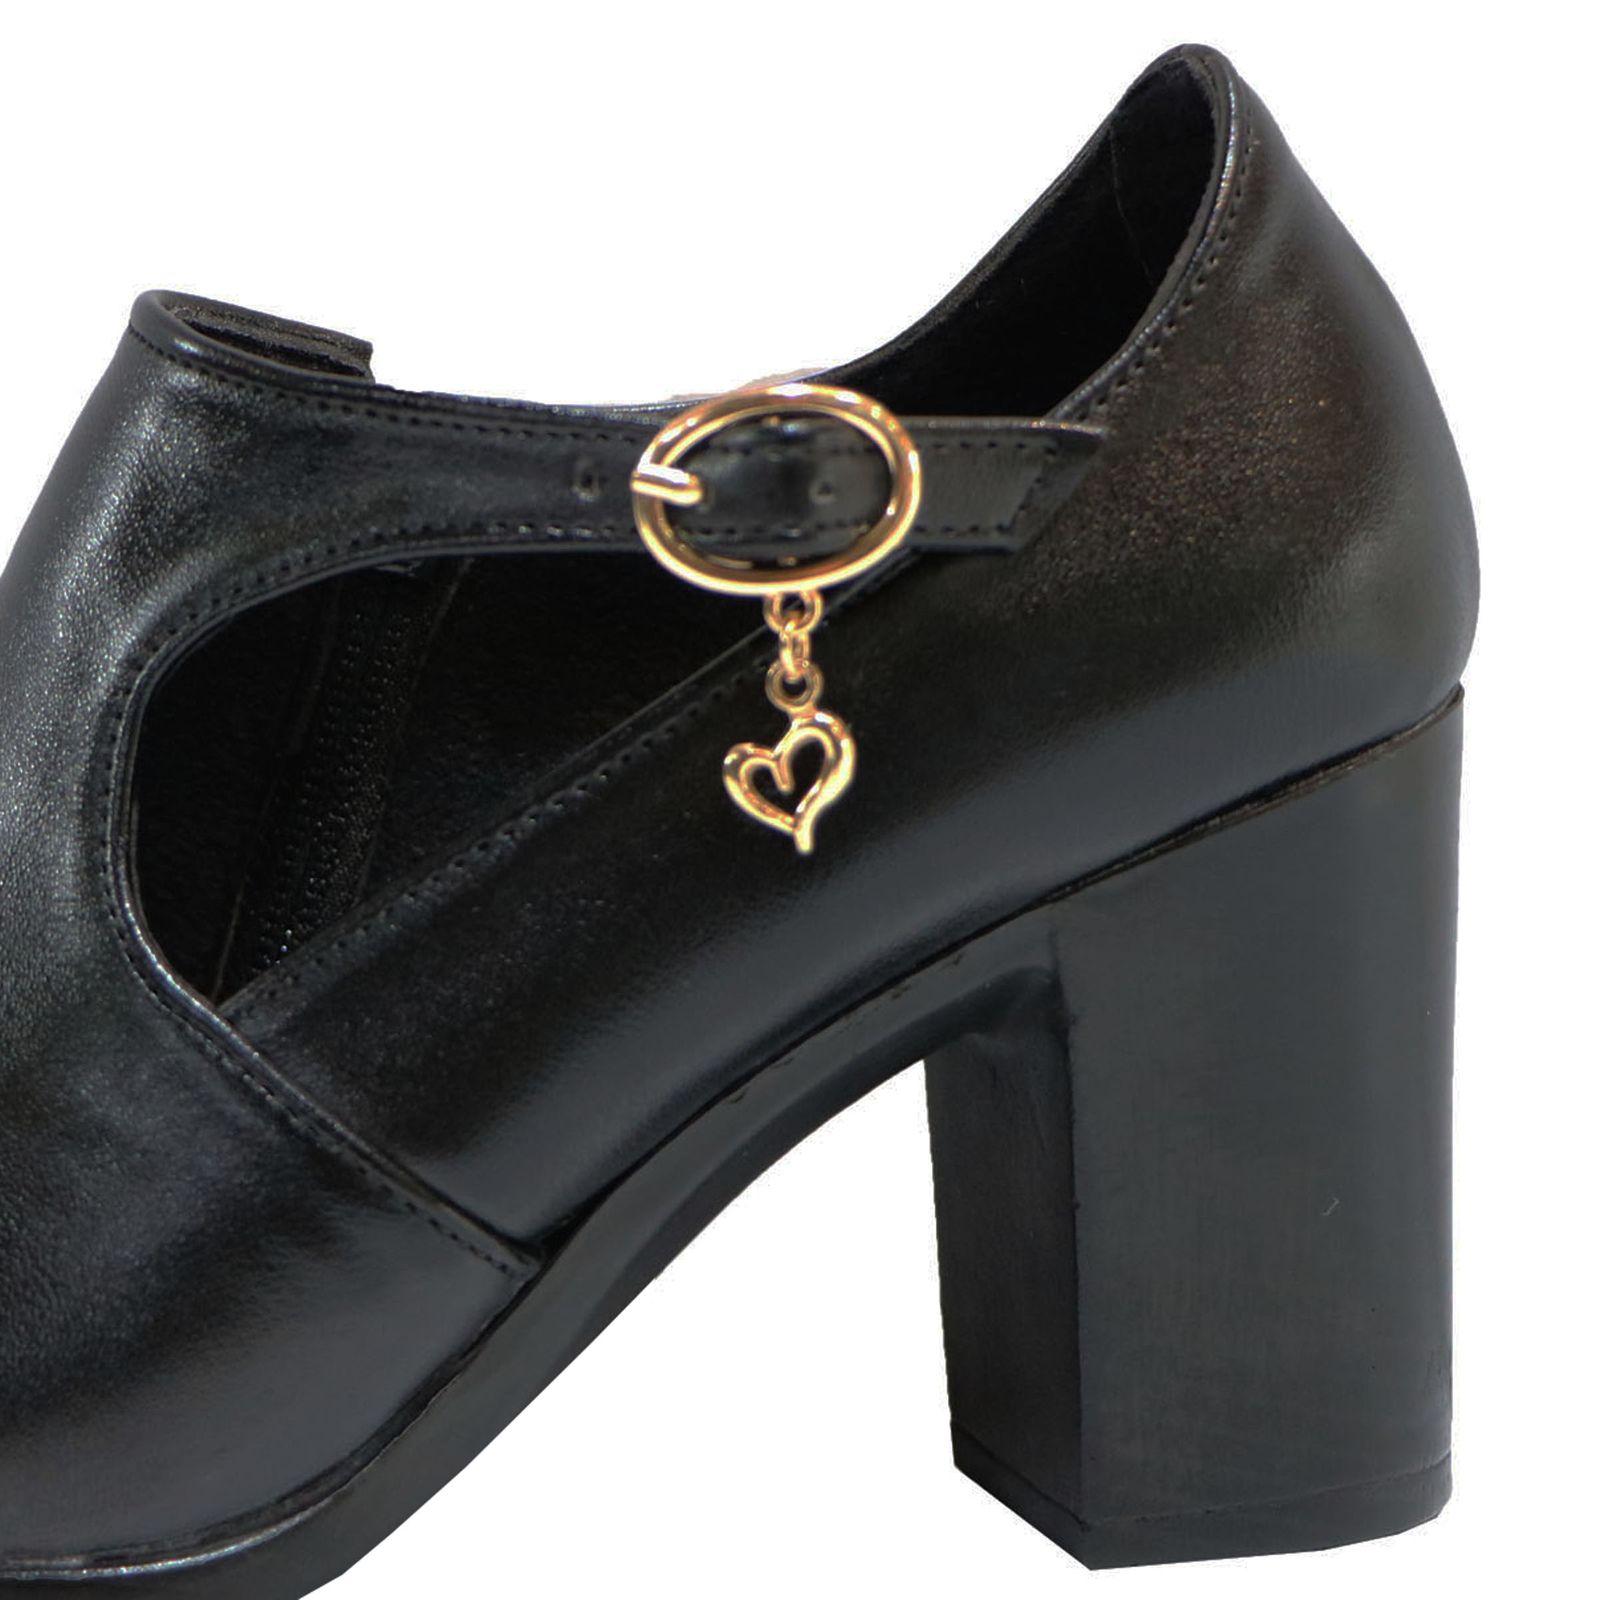 کفش زنانه کد 98223 -  - 6